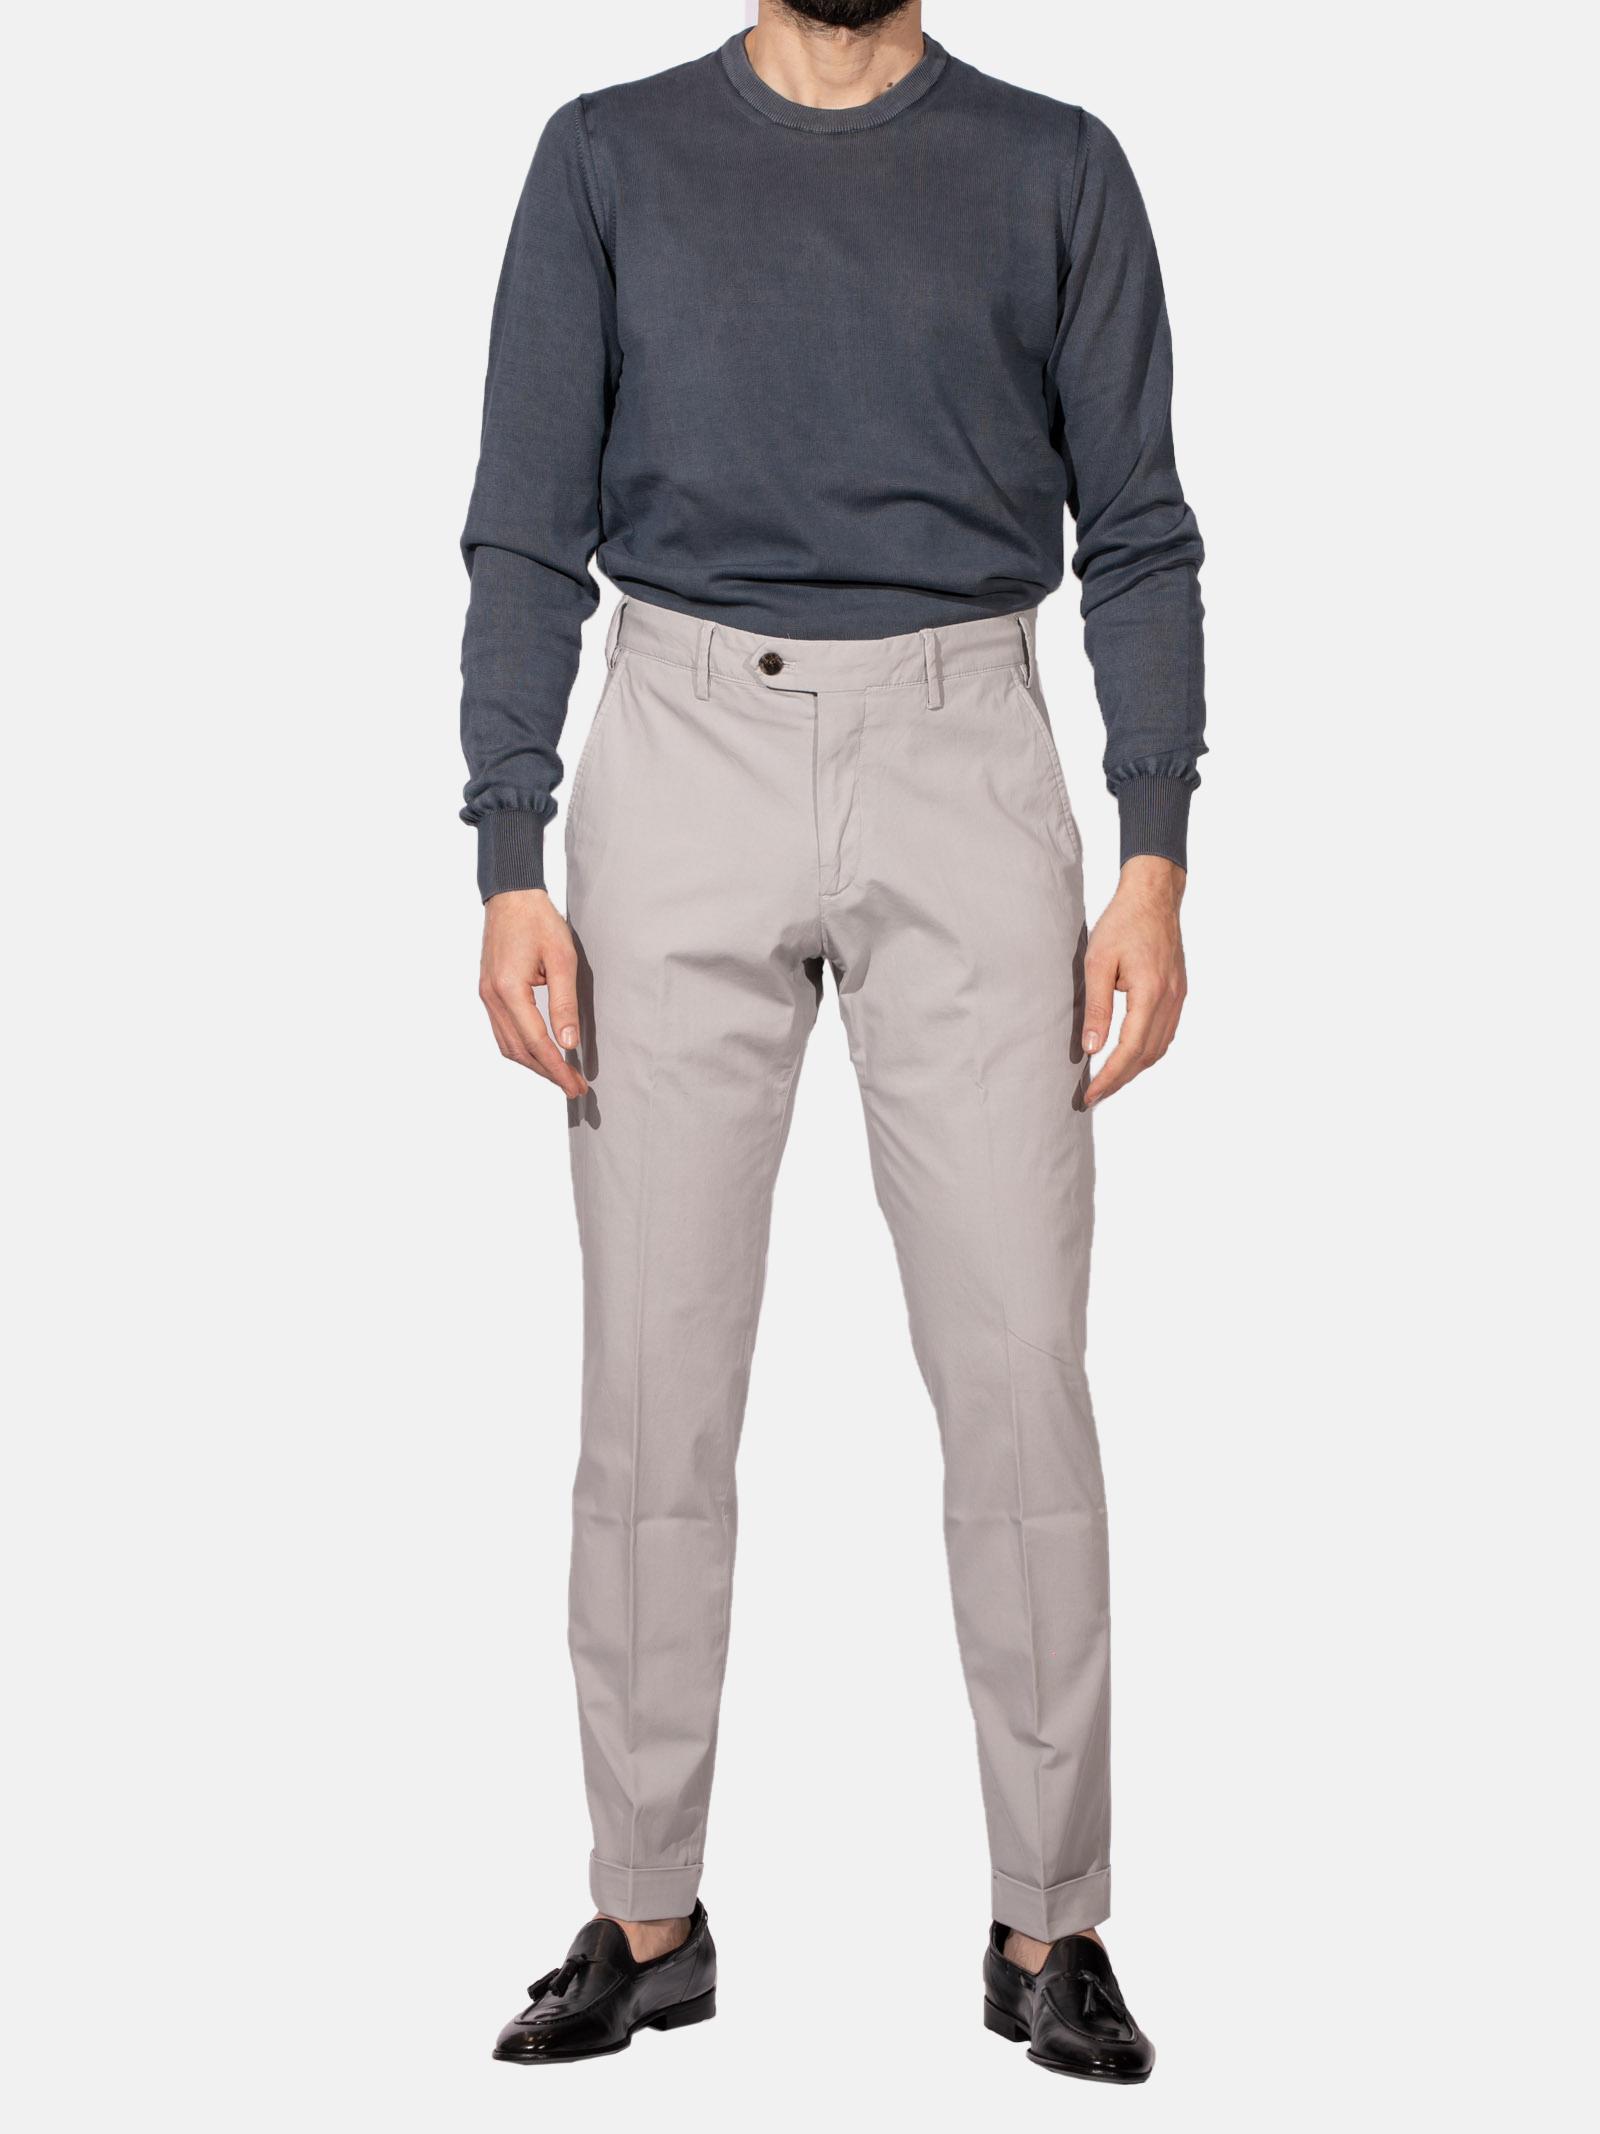 pantalone tasche america DEVORE | Pantalone | DVR3-P004206